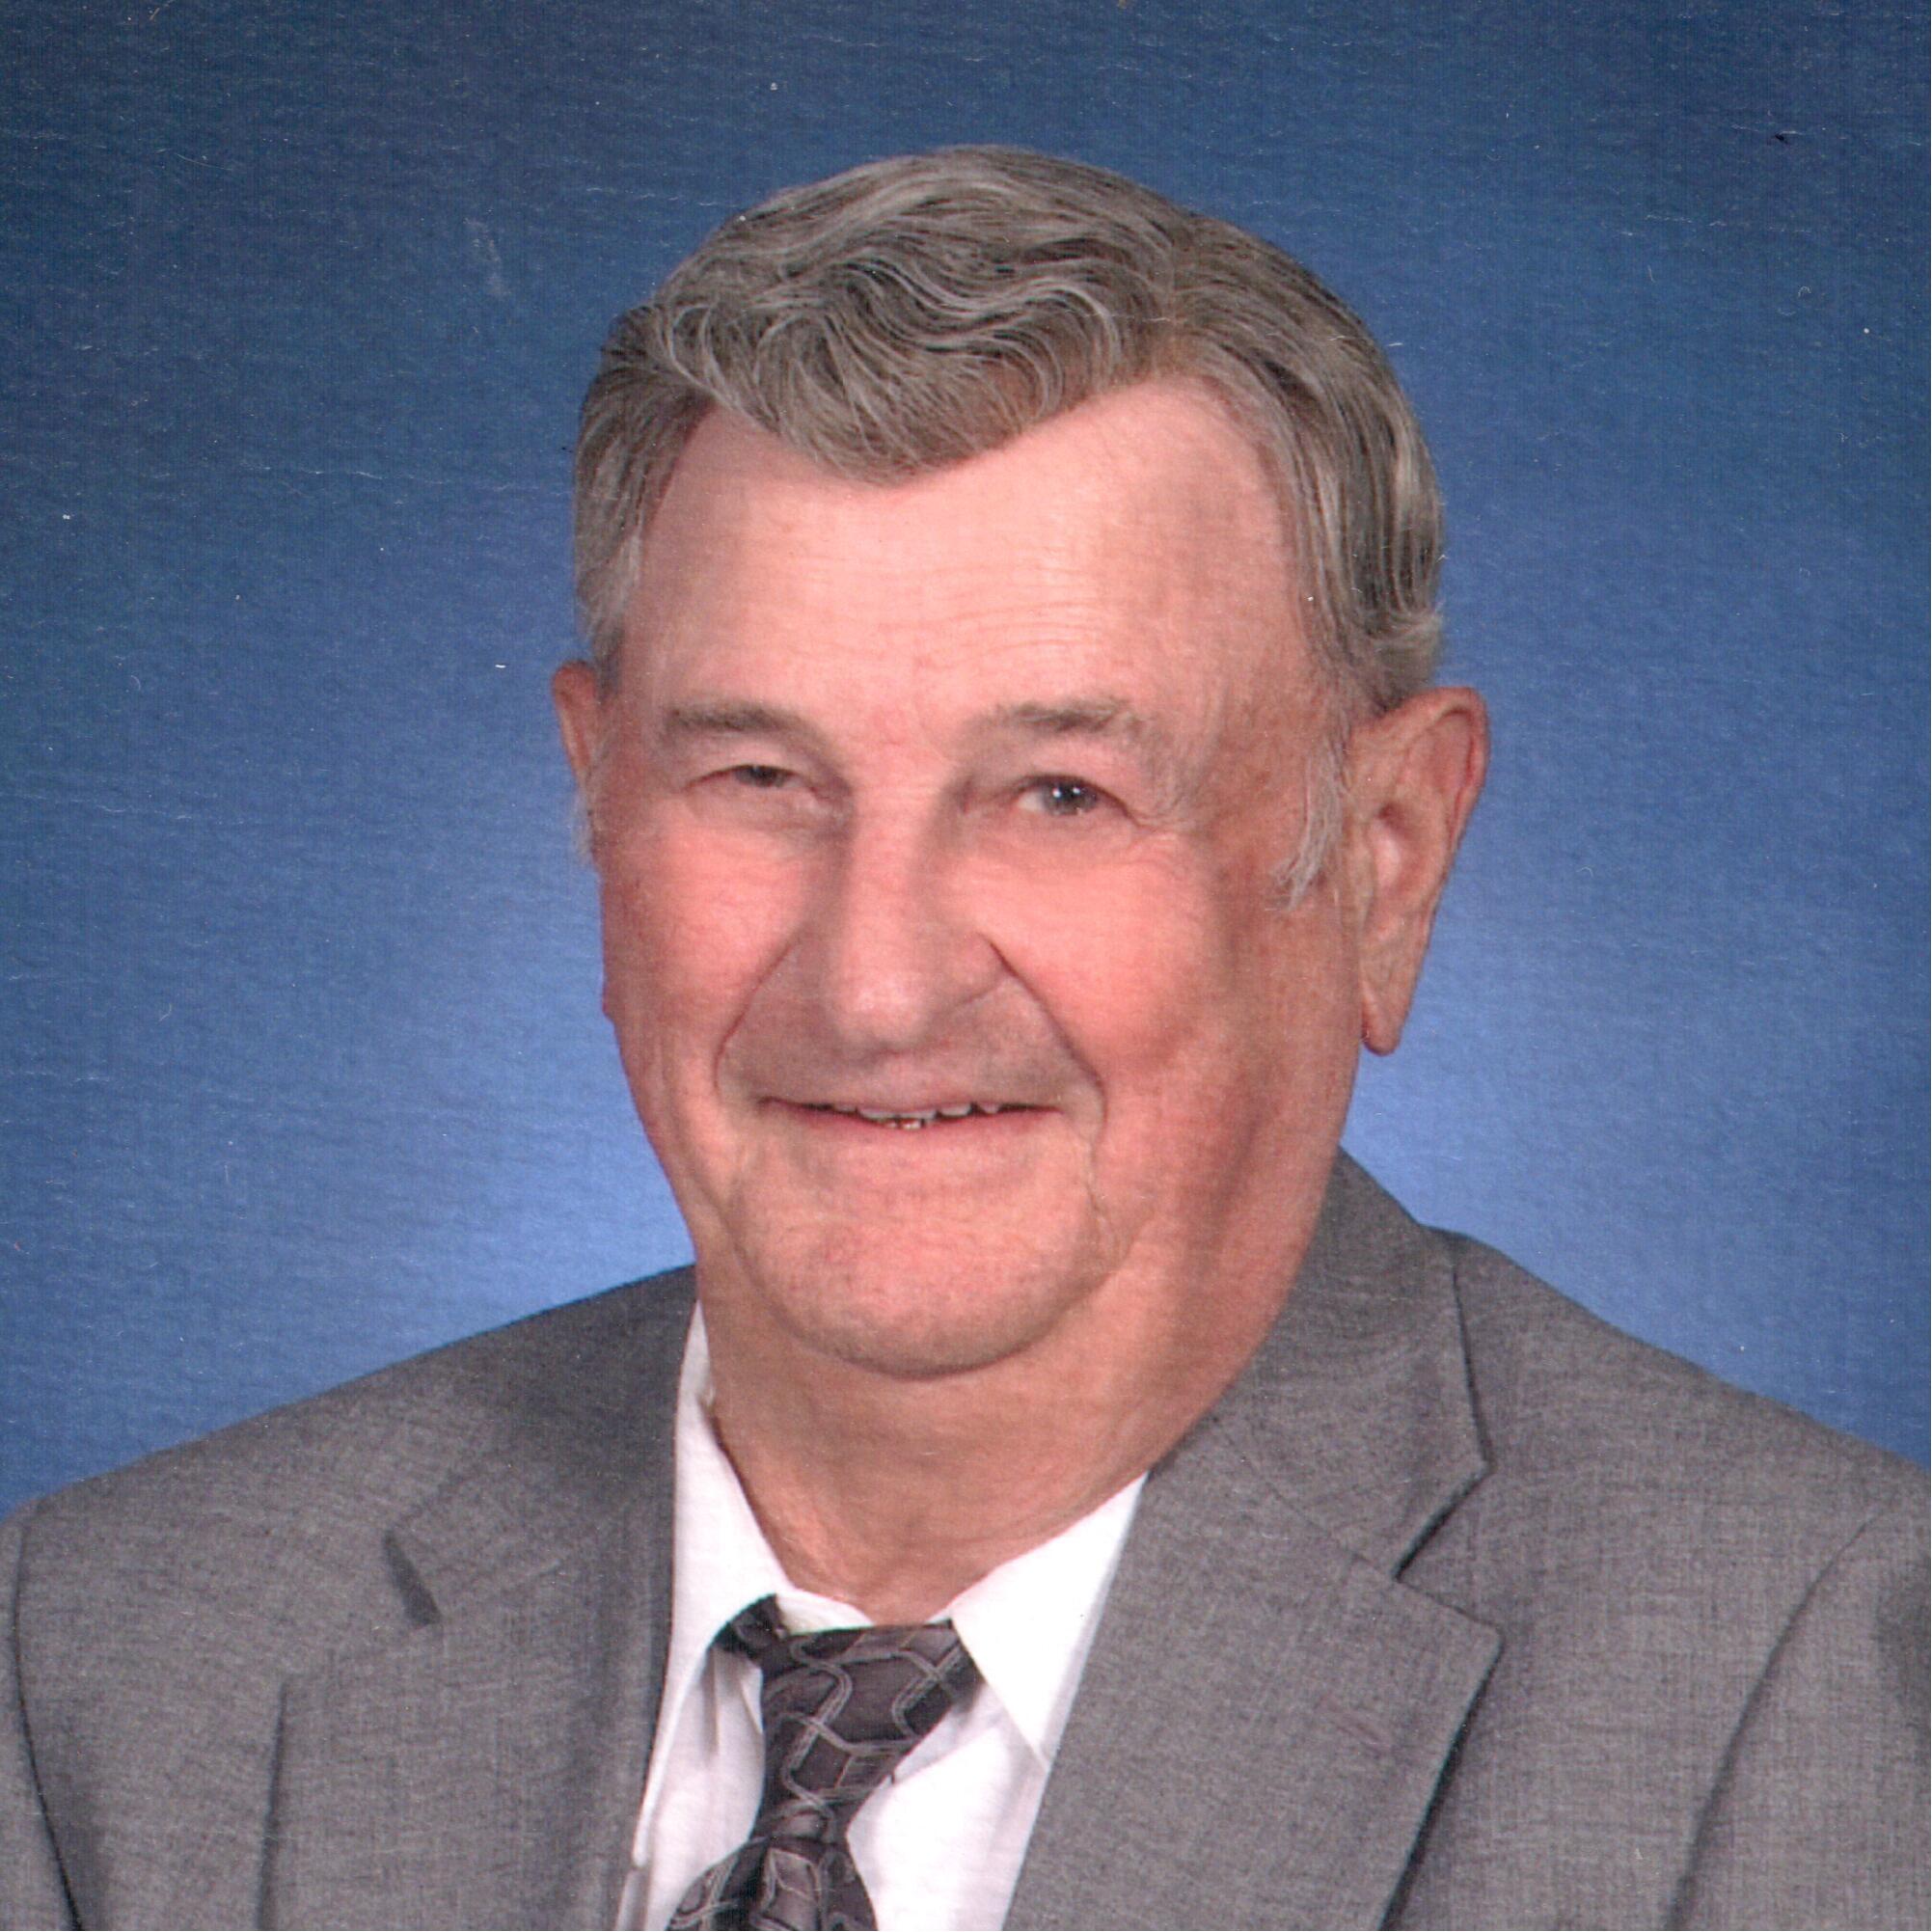 Elmer J. Schroering, age 81 of Jasper